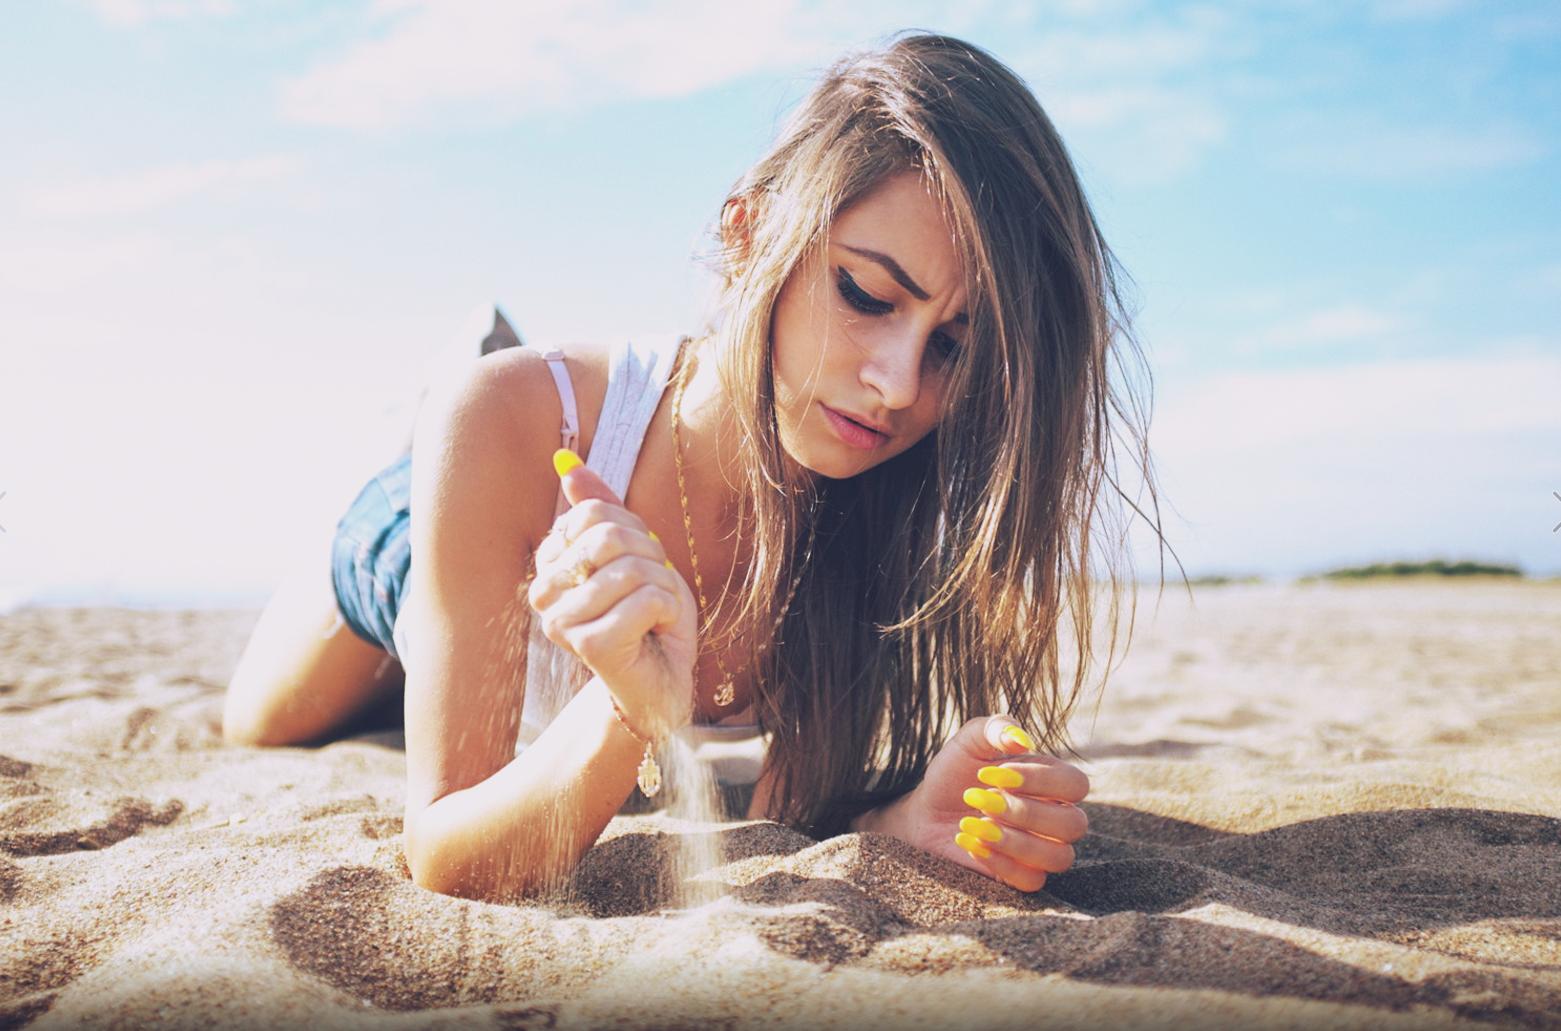 Wallpaper : sunlight, women outdoors, 500px, model, sea